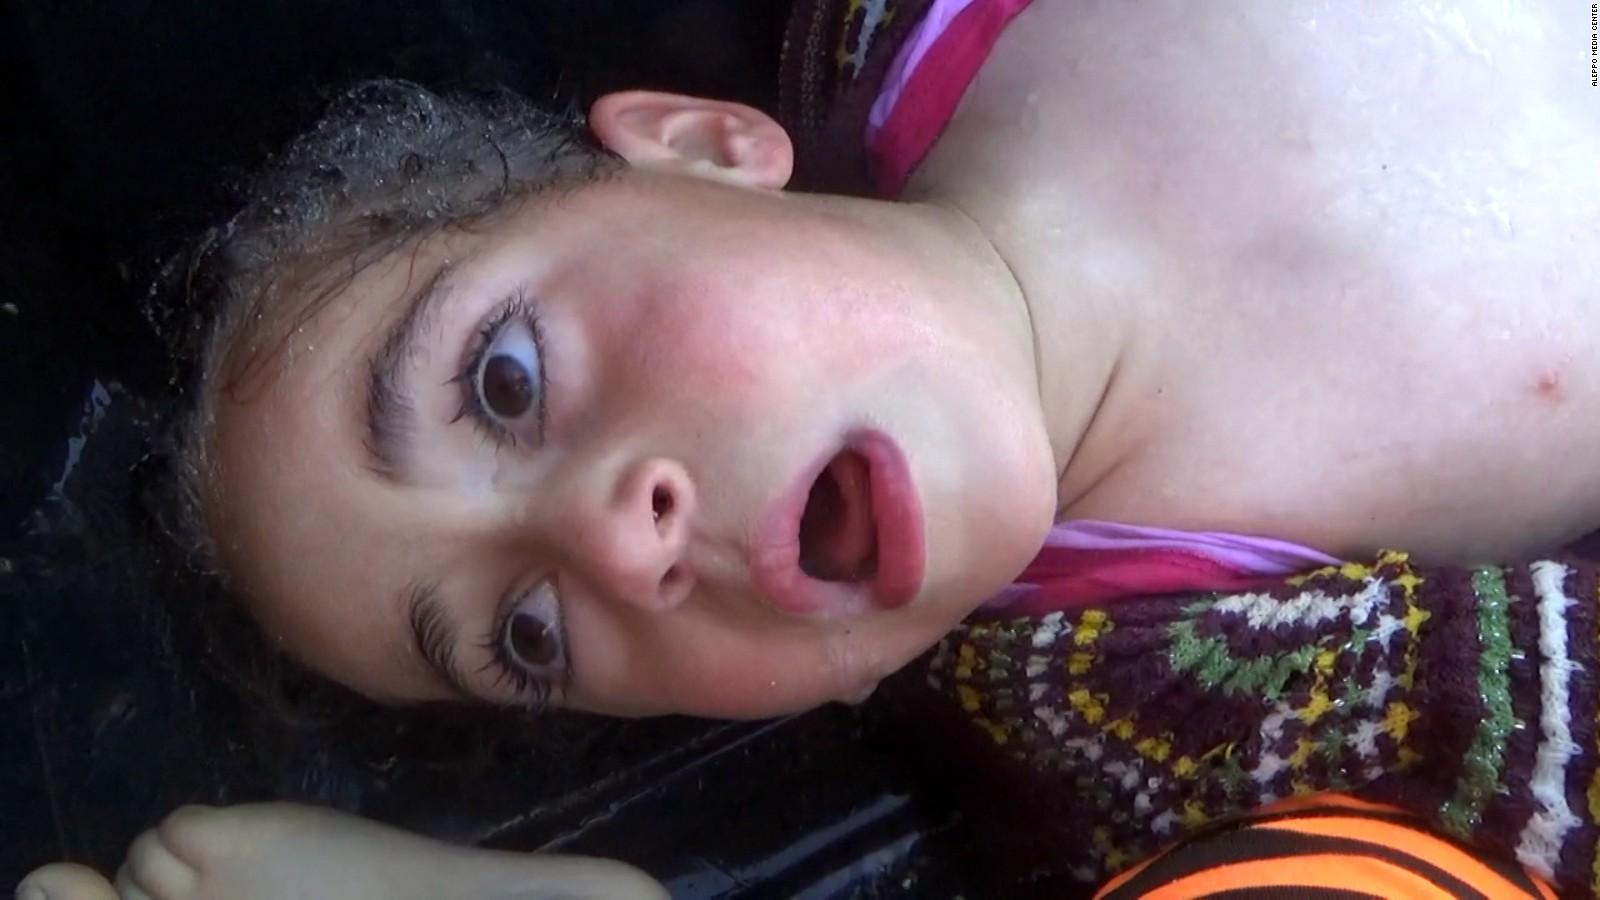 170509123825-syria-girl-no-hp-tease-full-169